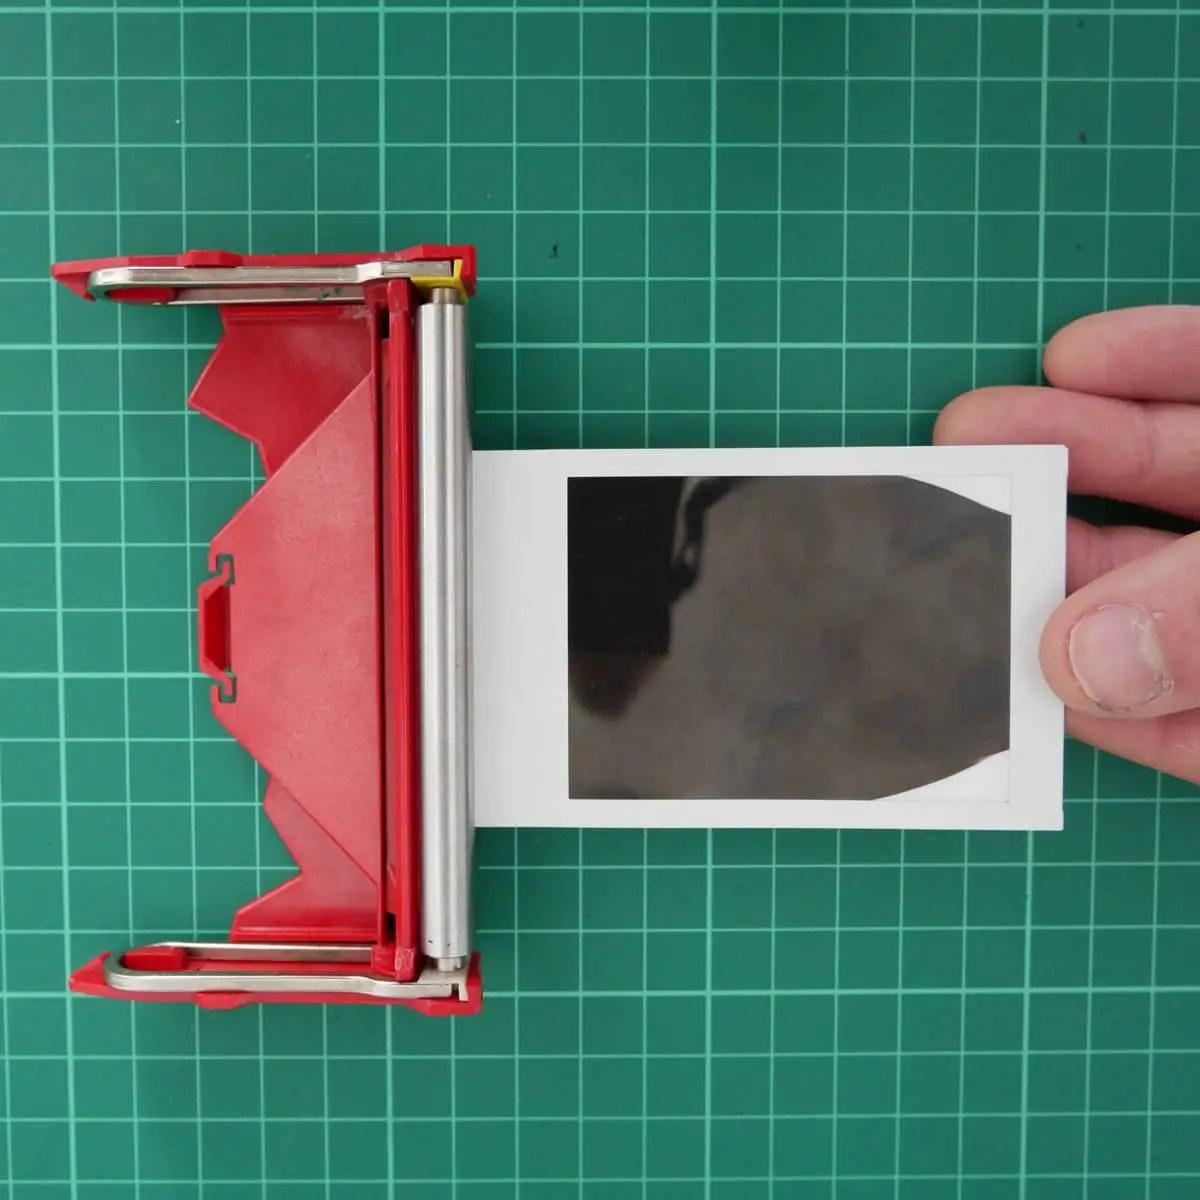 Insert - Fujifilm Instax Mini in a 35mm camera